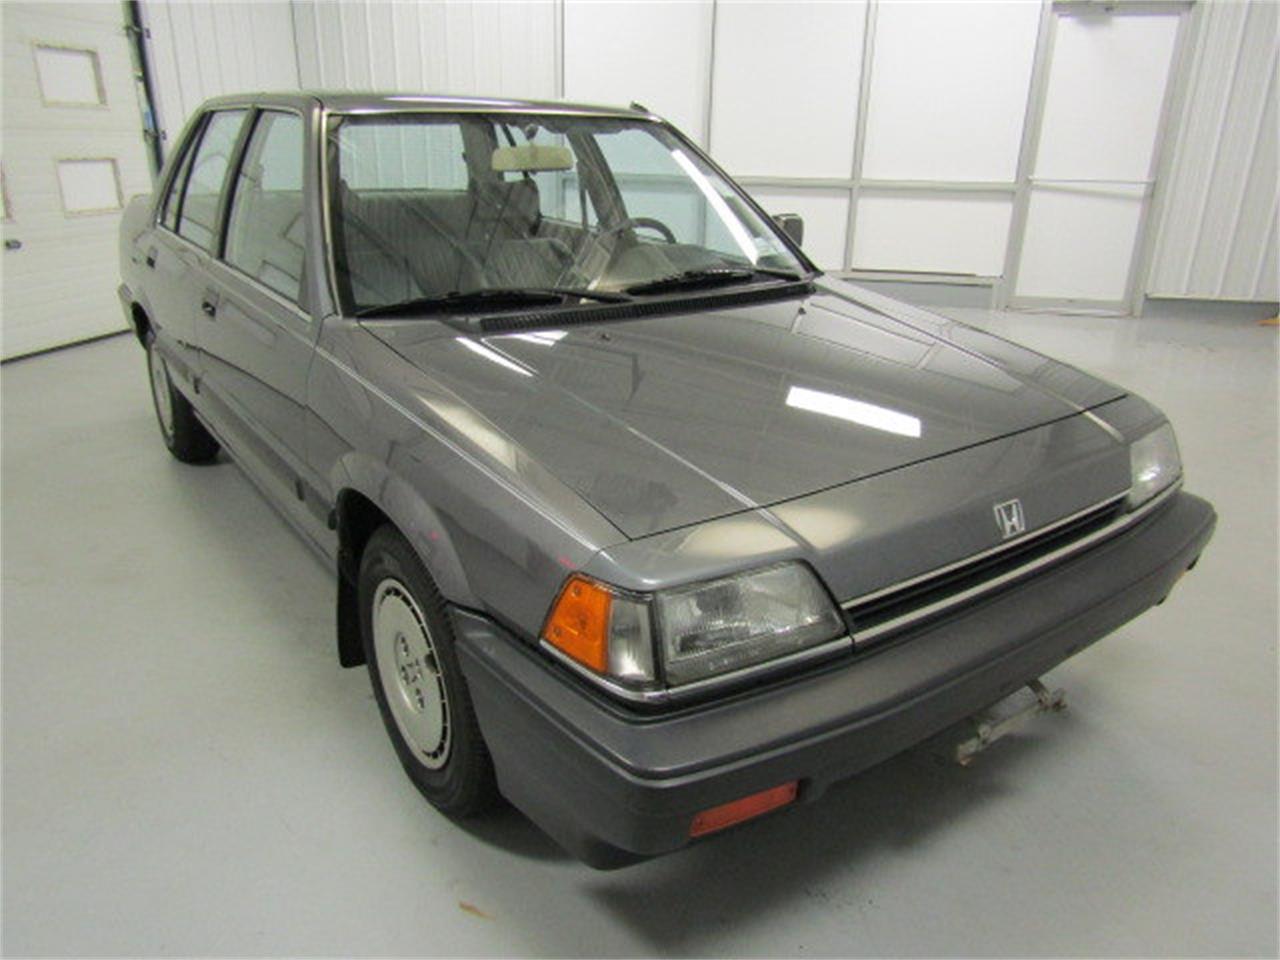 1987 Honda Civic for Sale   ClassicCars.com   CC-914159